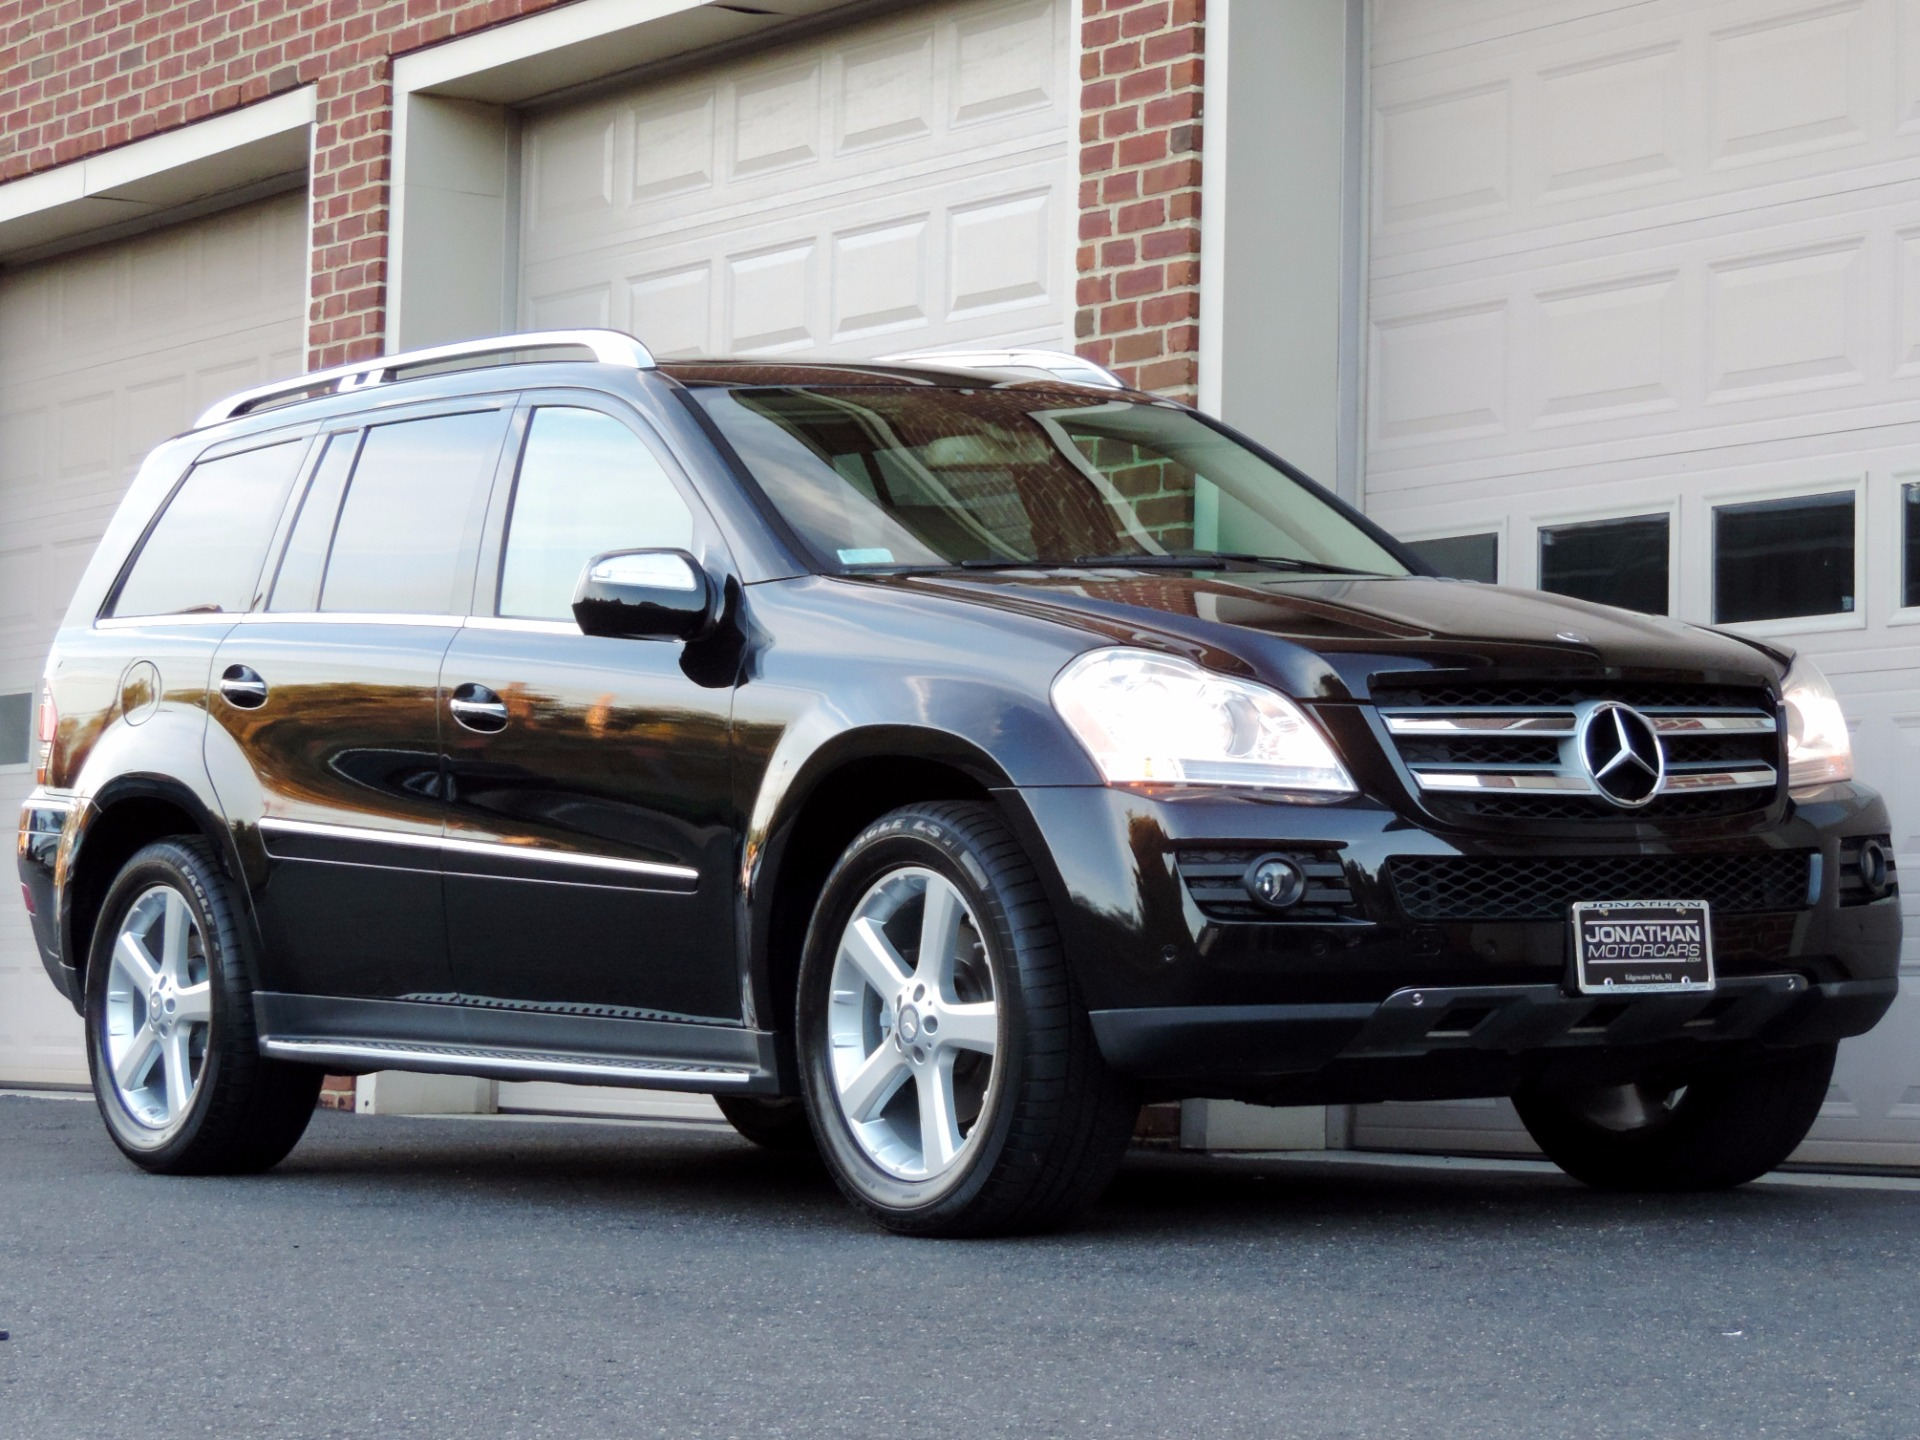 2009 mercedes benz gl class gl 450 4matic stock 441686 for Mercedes benz nj dealerships